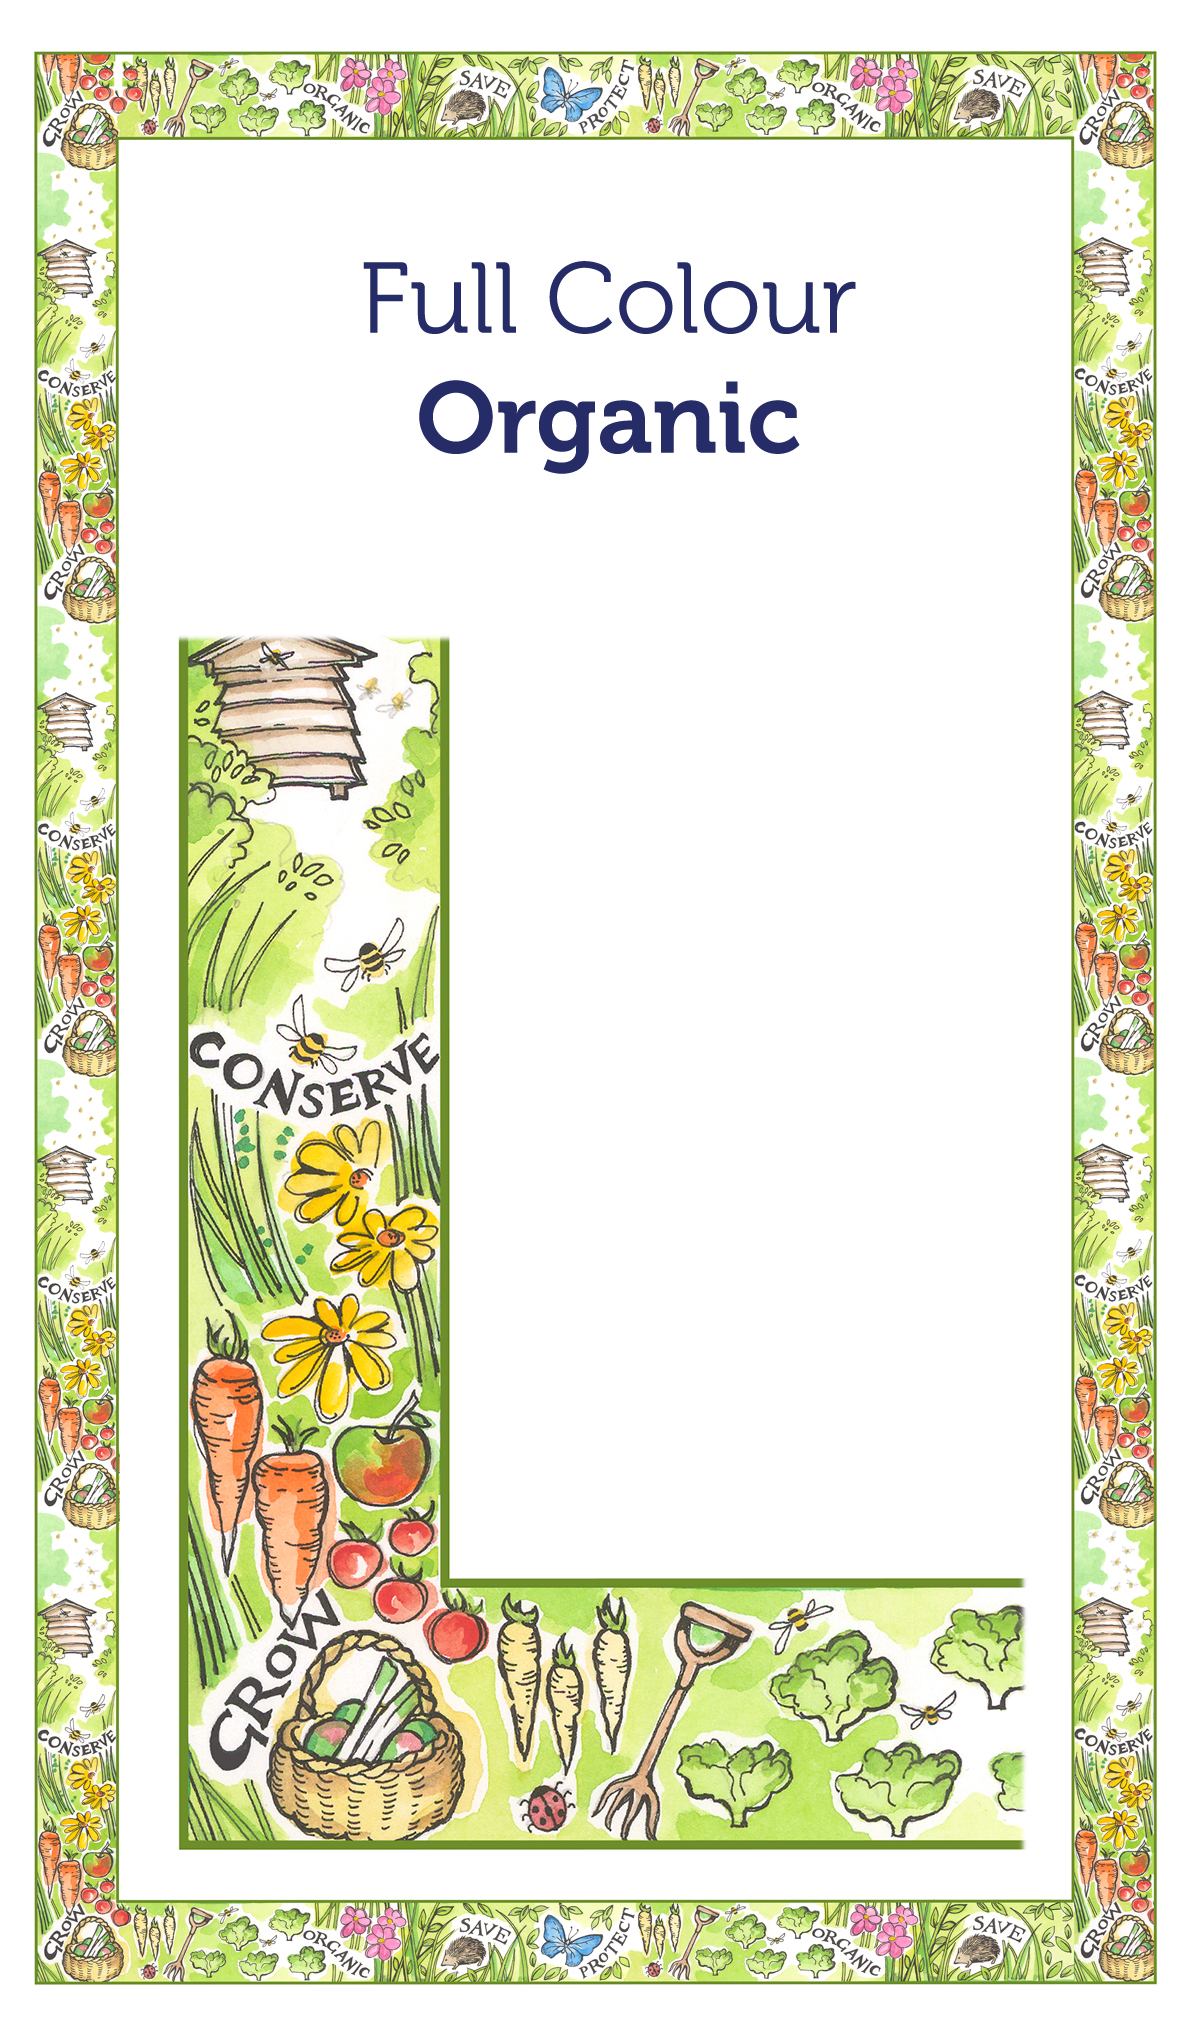 Tea Towel Borders 19 Organic Full Colour